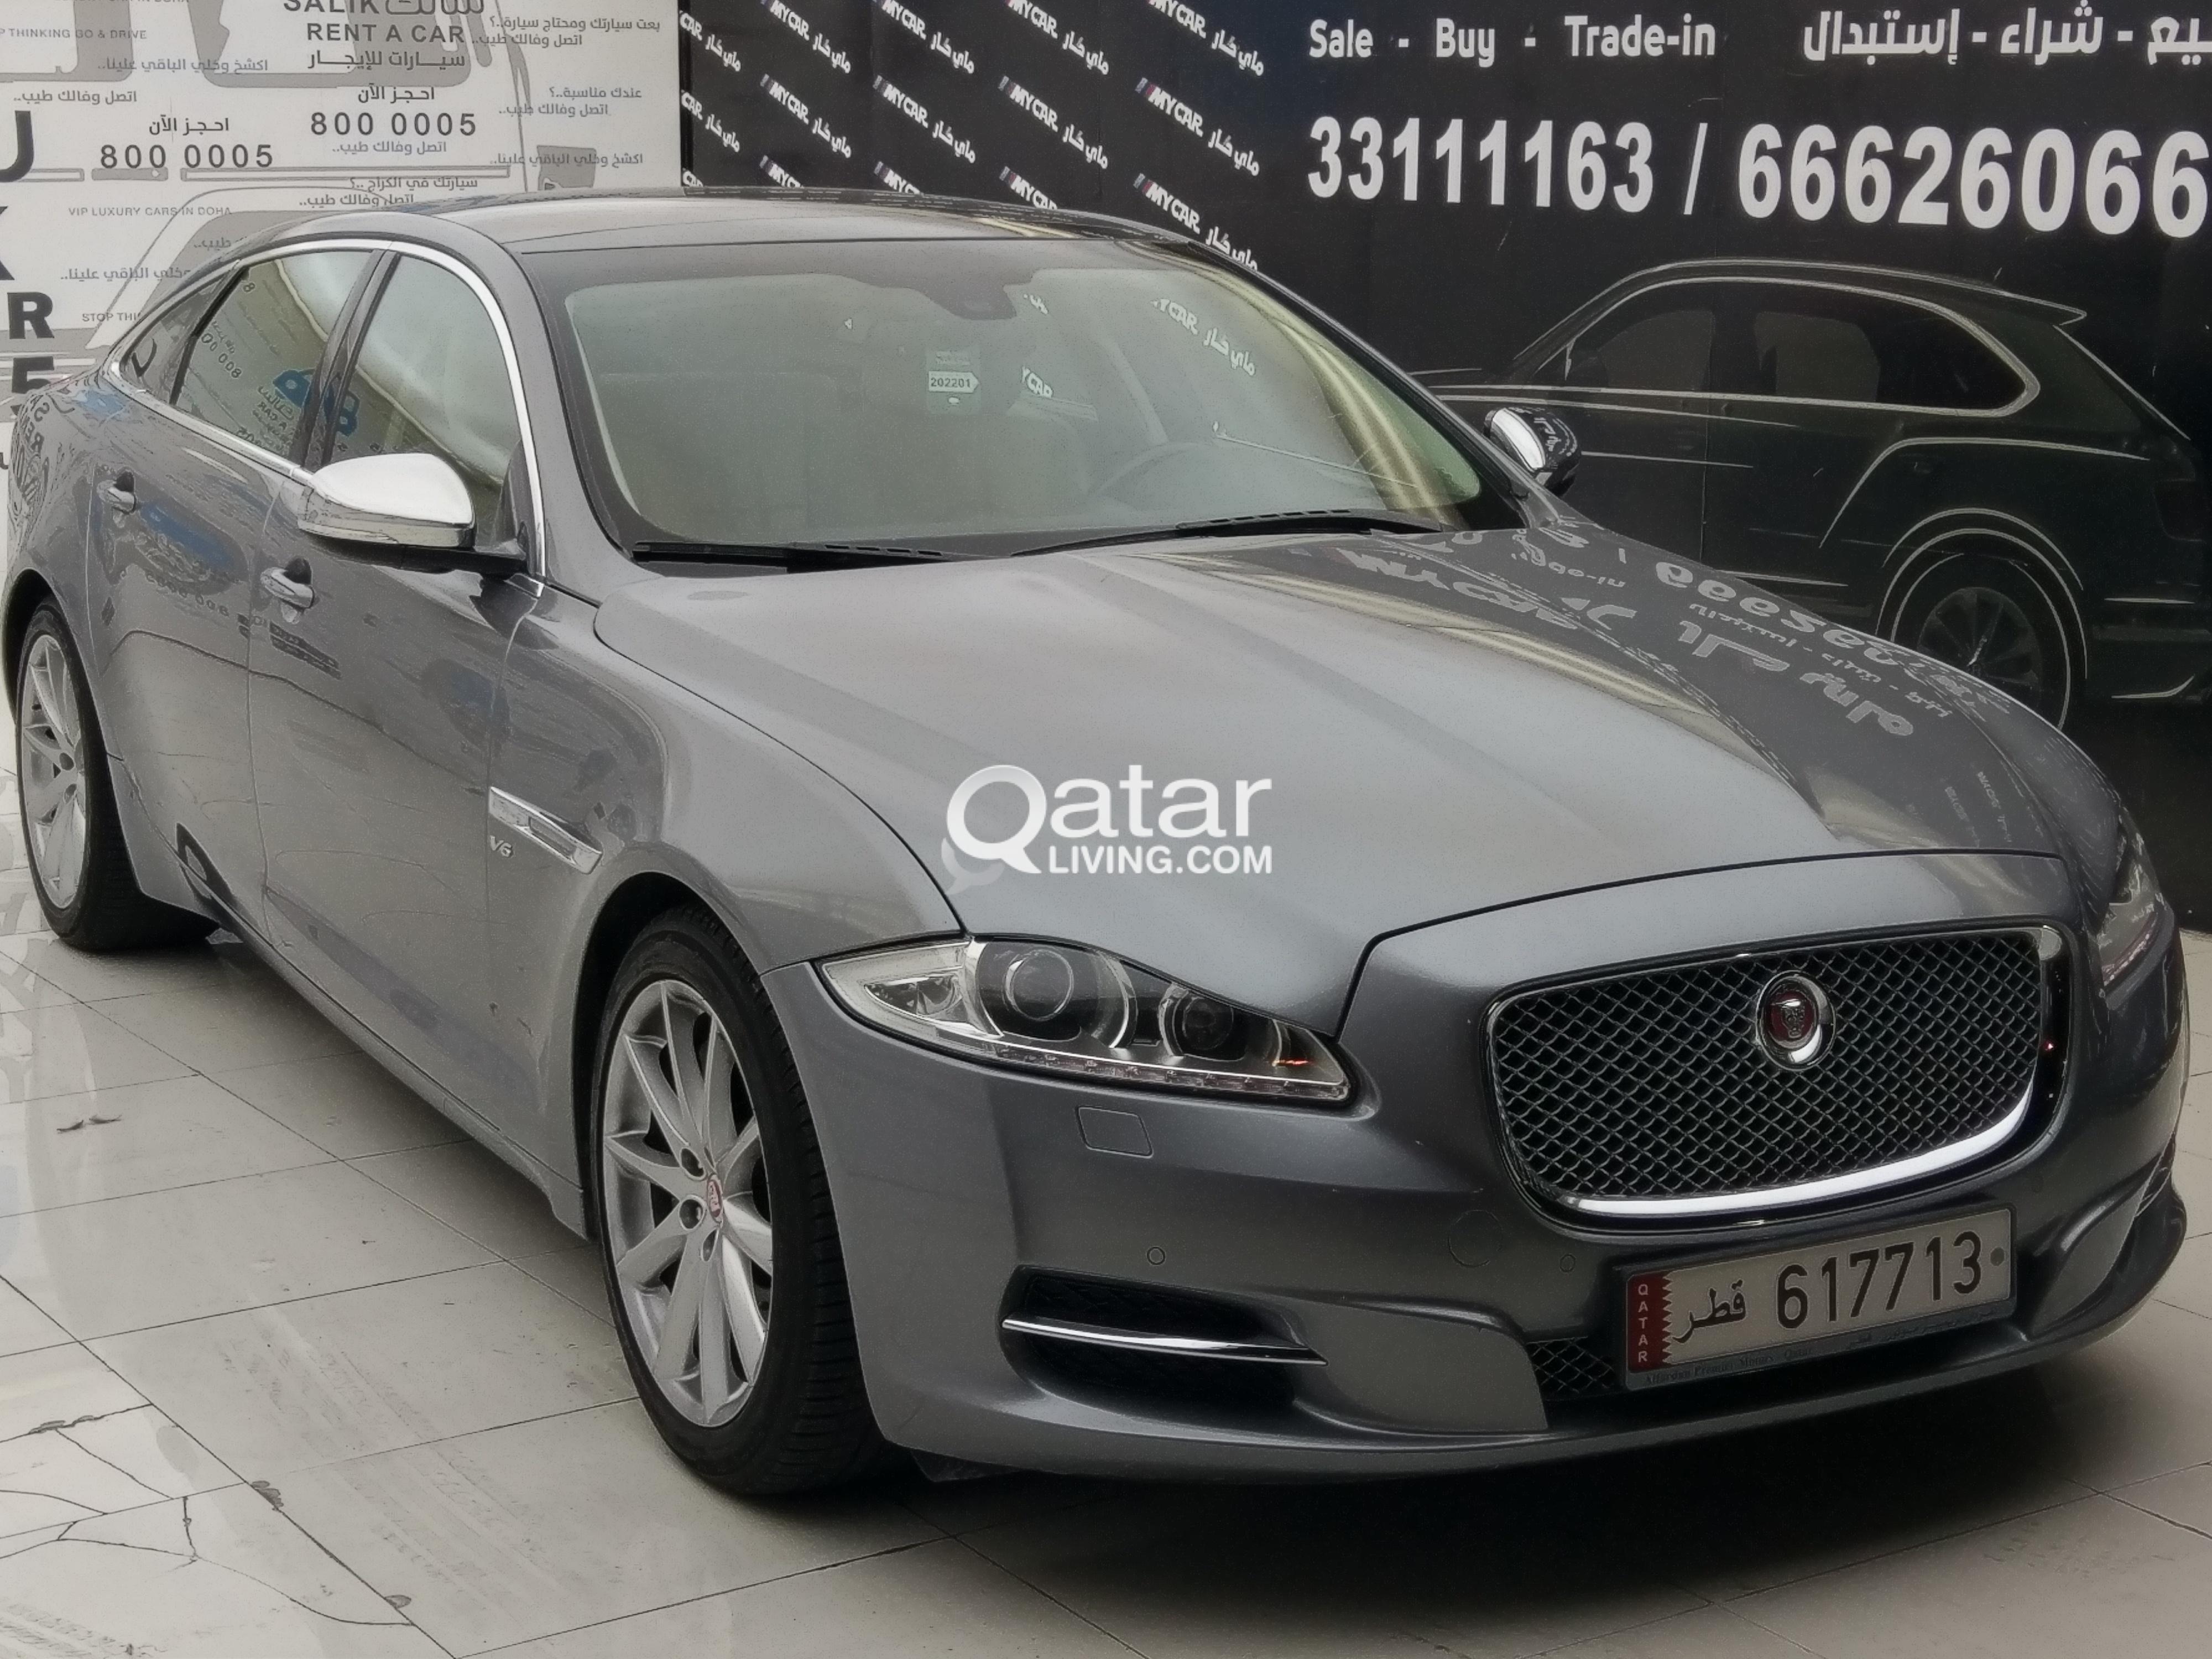 show left more magazine news xjl drive automobile jaguar side rear xjr first